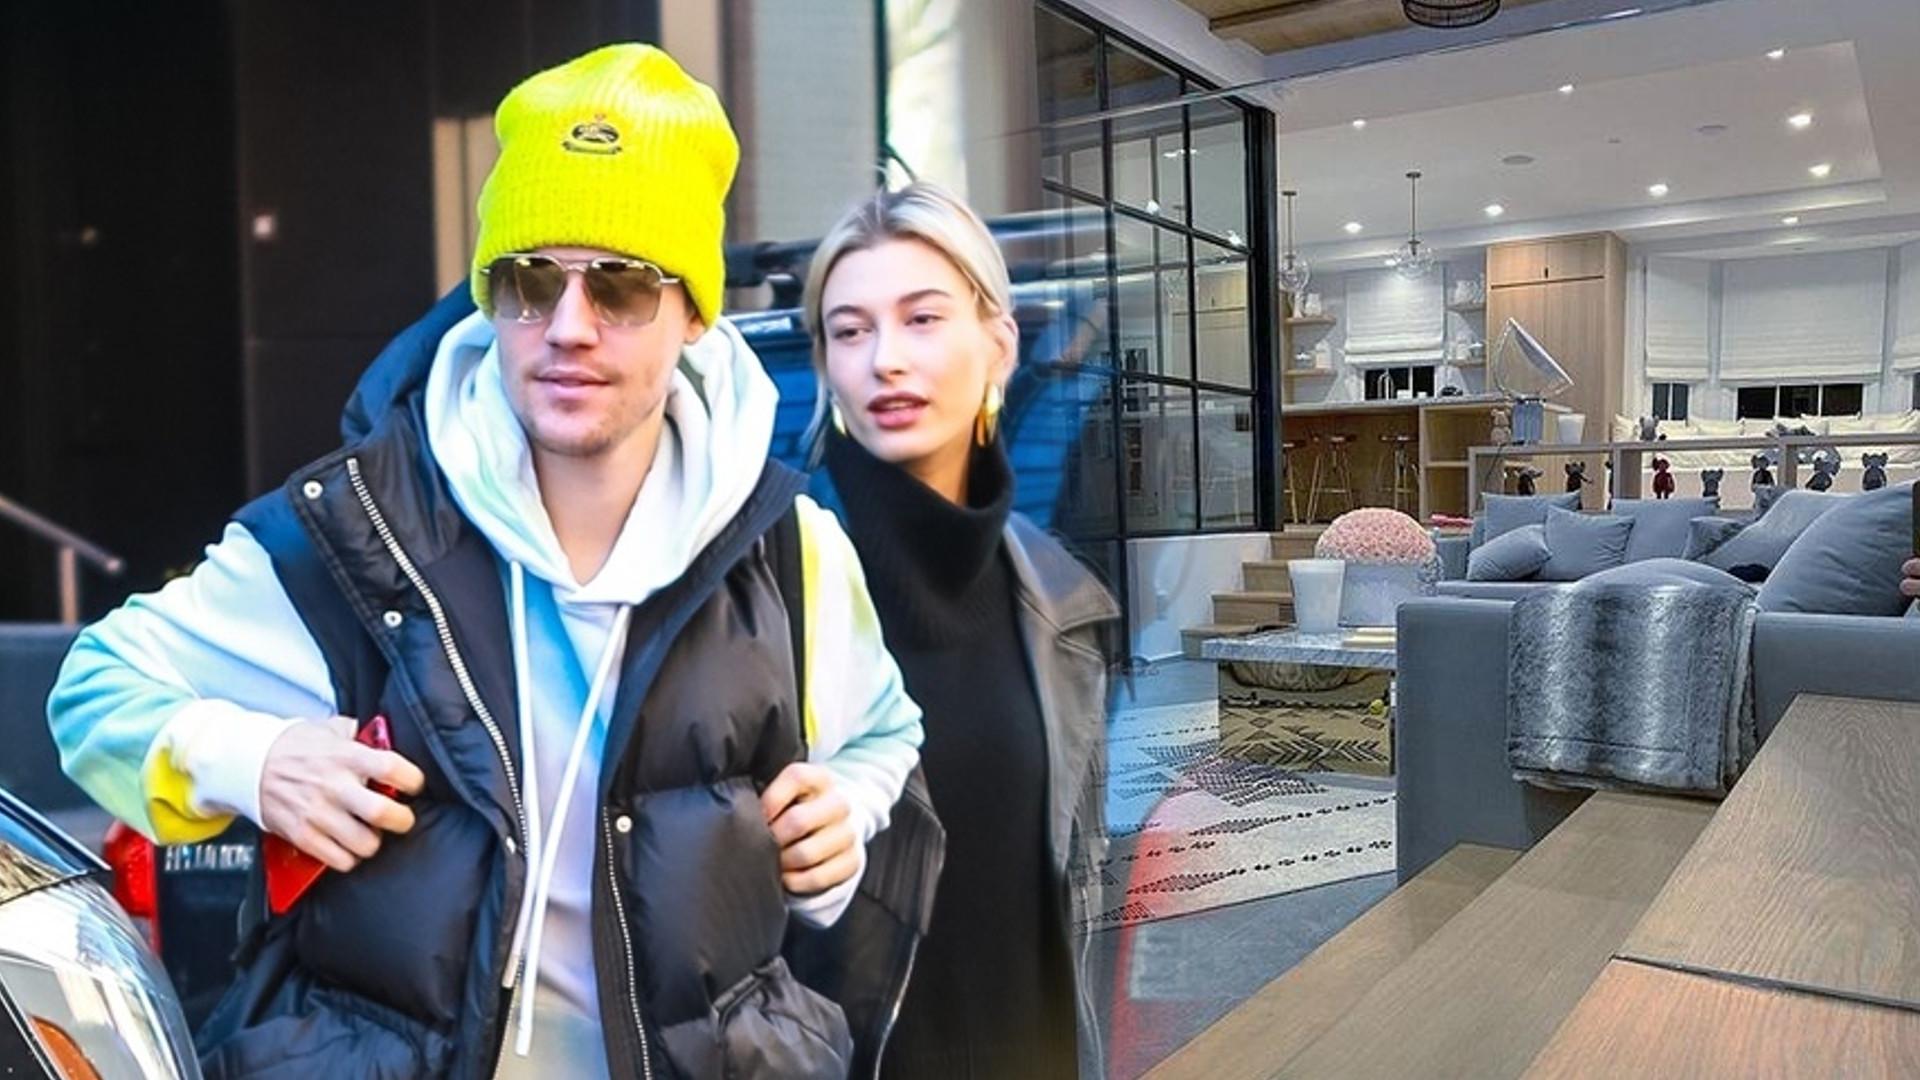 LUKSUSOWE mieszkanie Justina Biebera